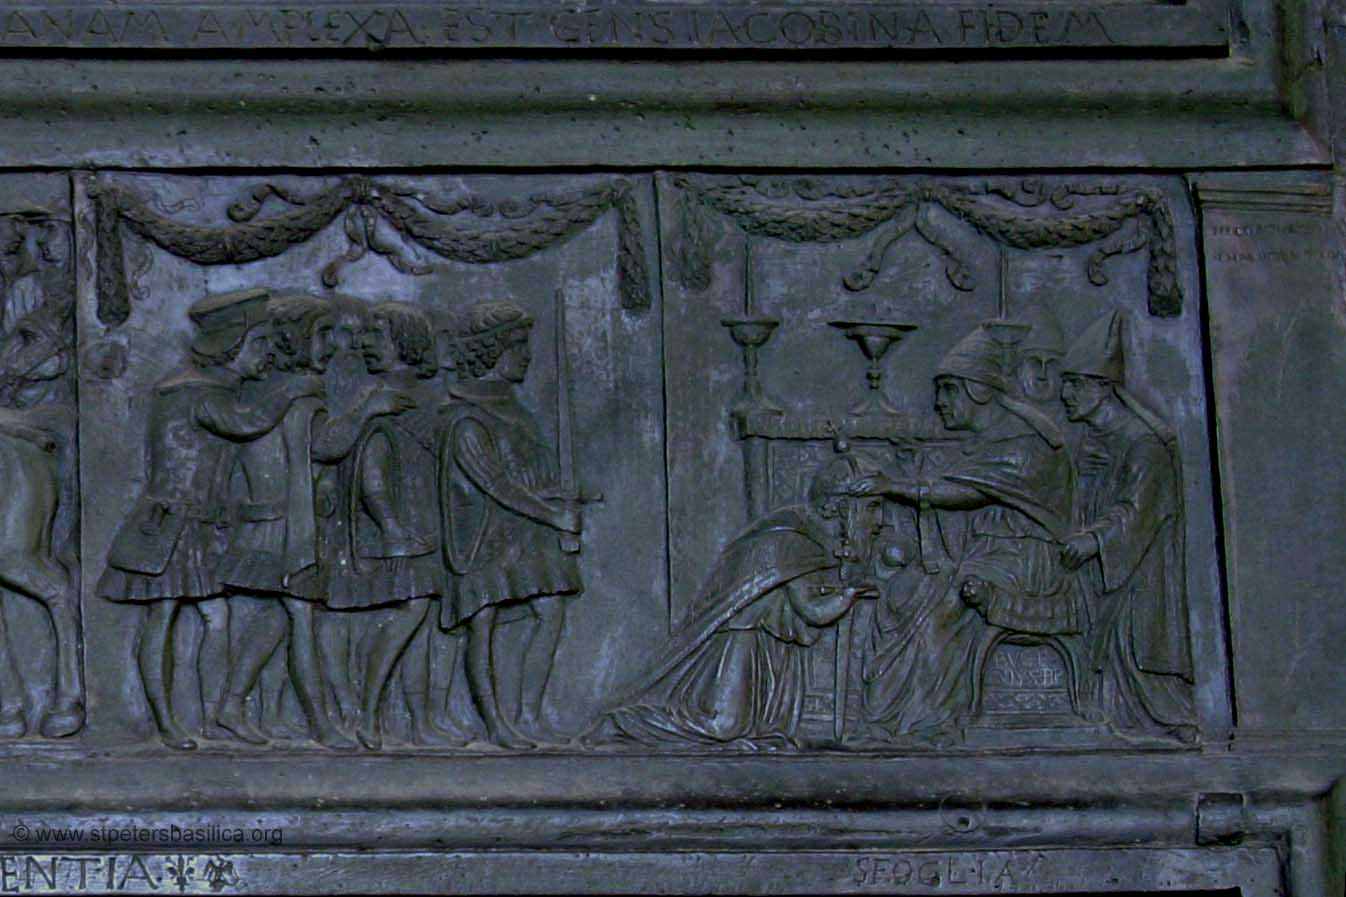 The coronation of the emperor Sigismund & St. Peteru0027s - The Filarete Door pezcame.com